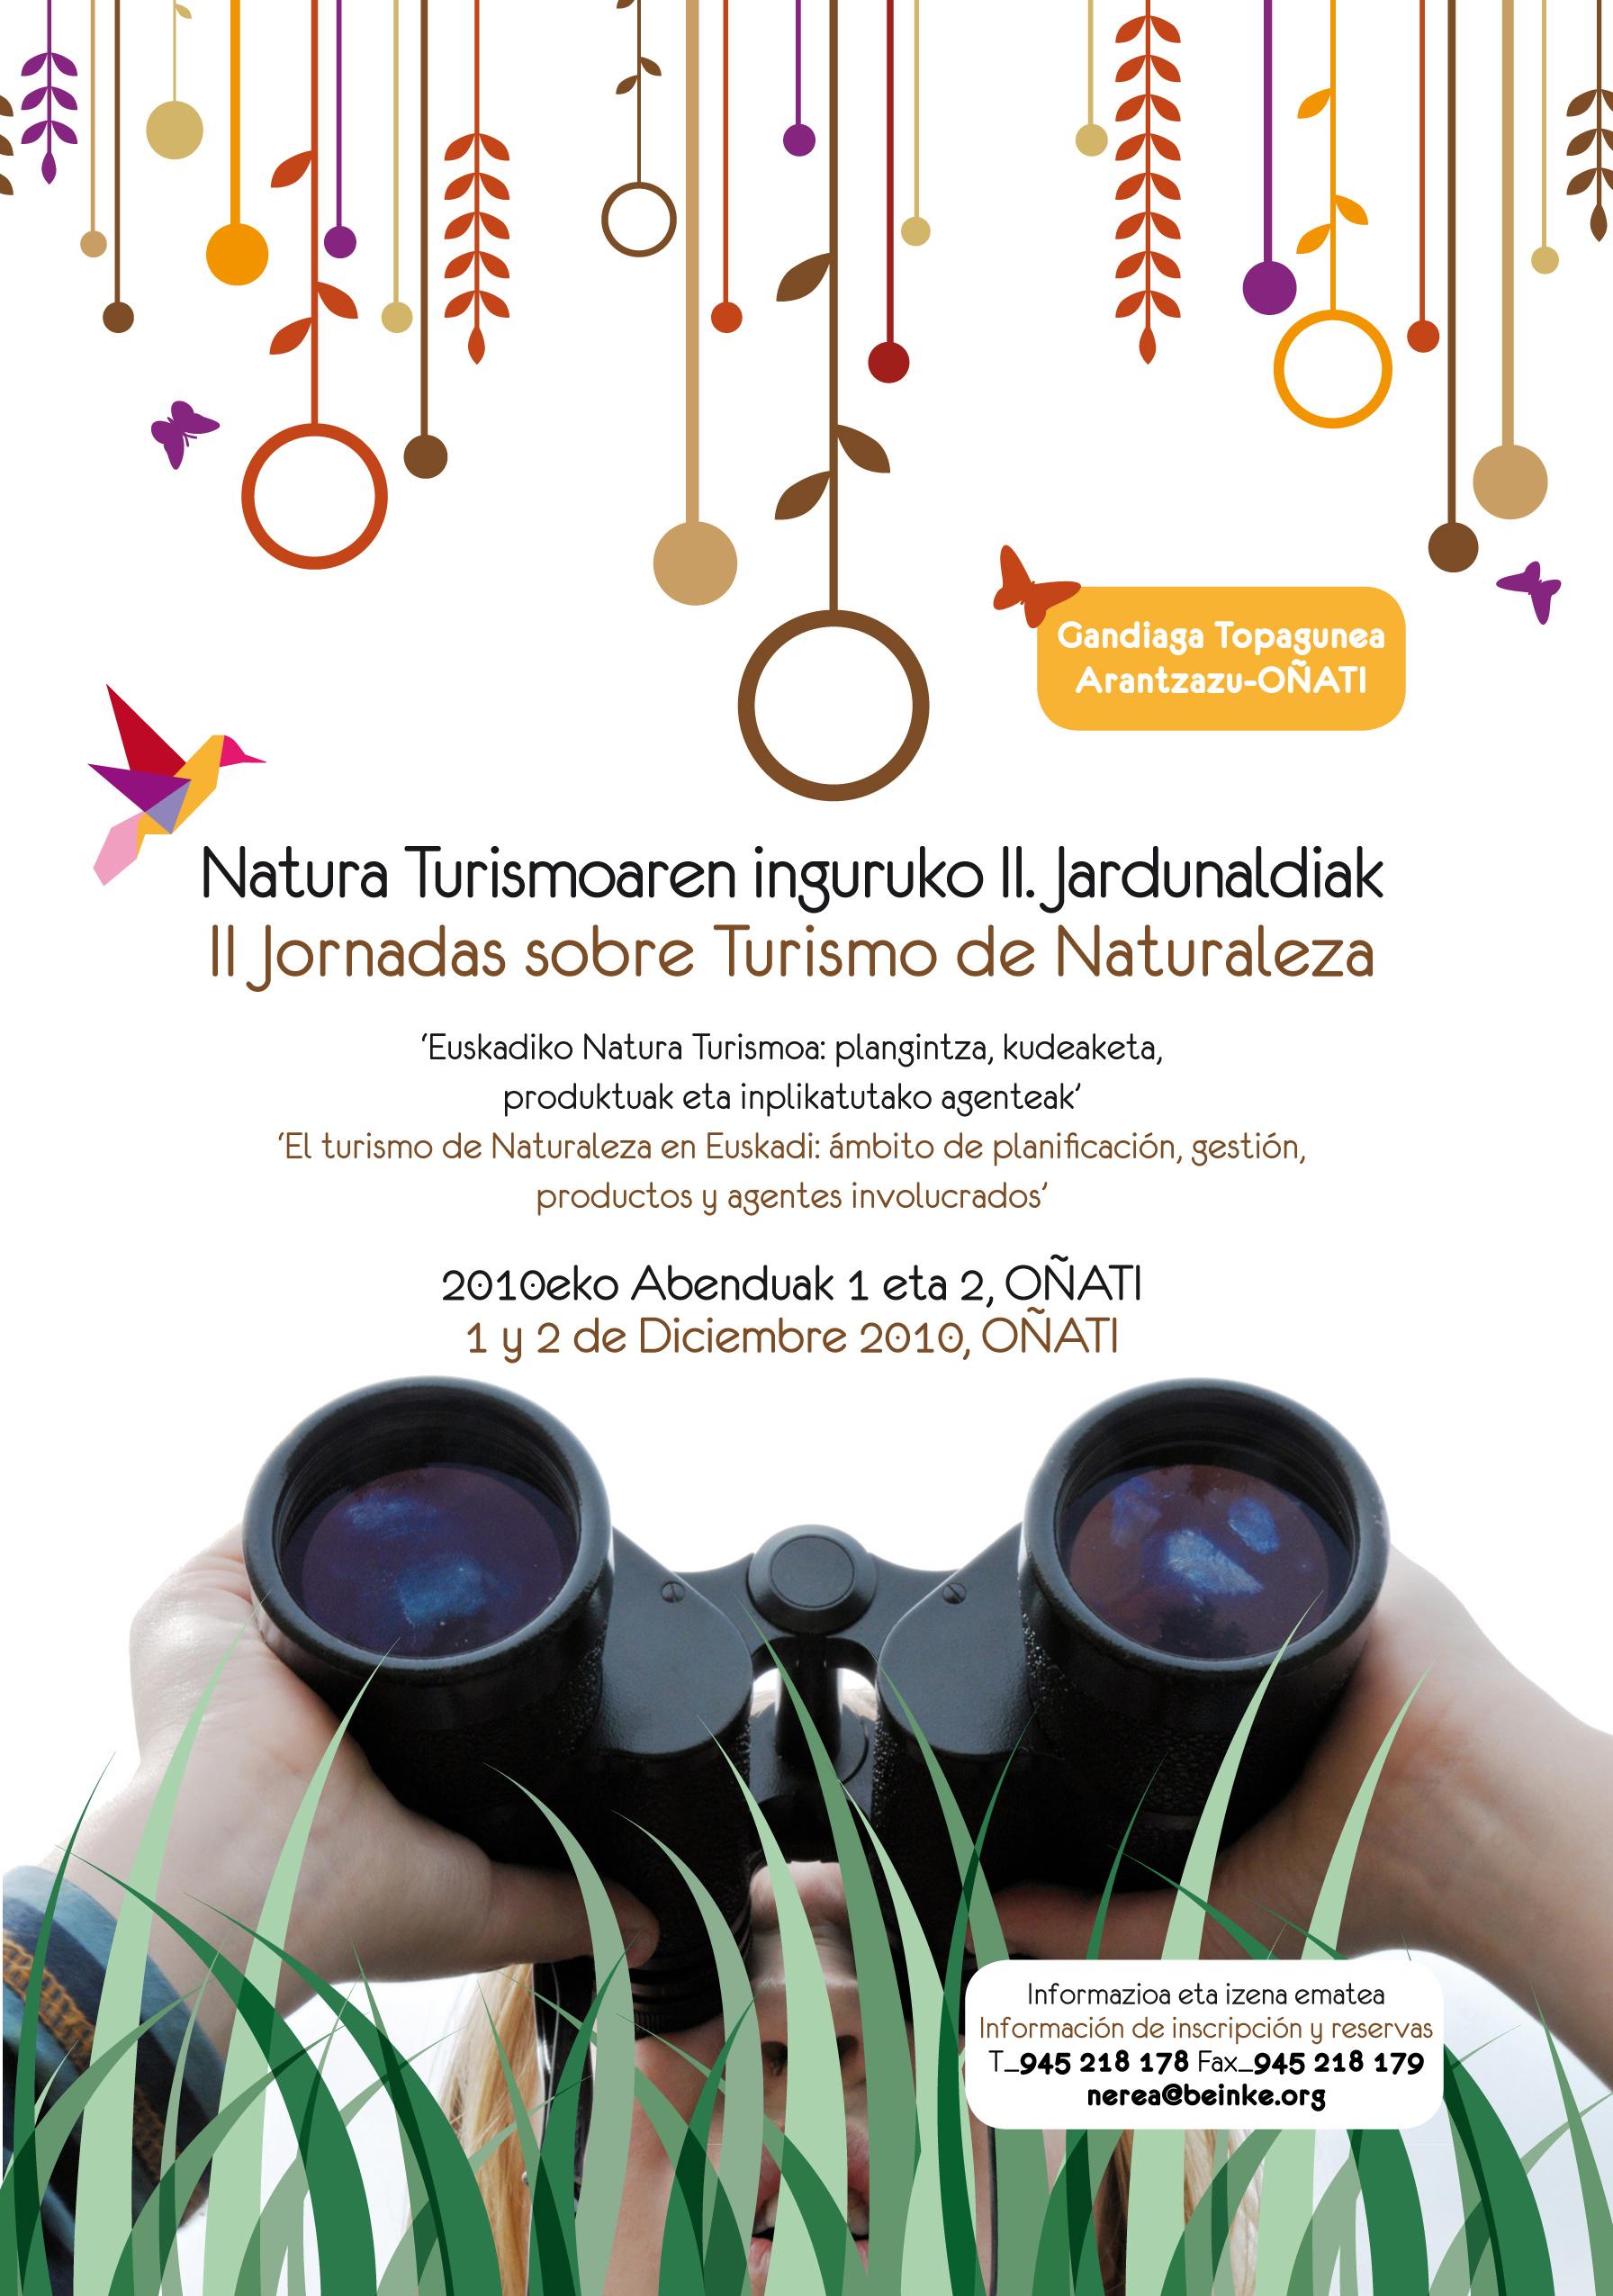 folleto_jornada-turismo-naturaleza_Oñati